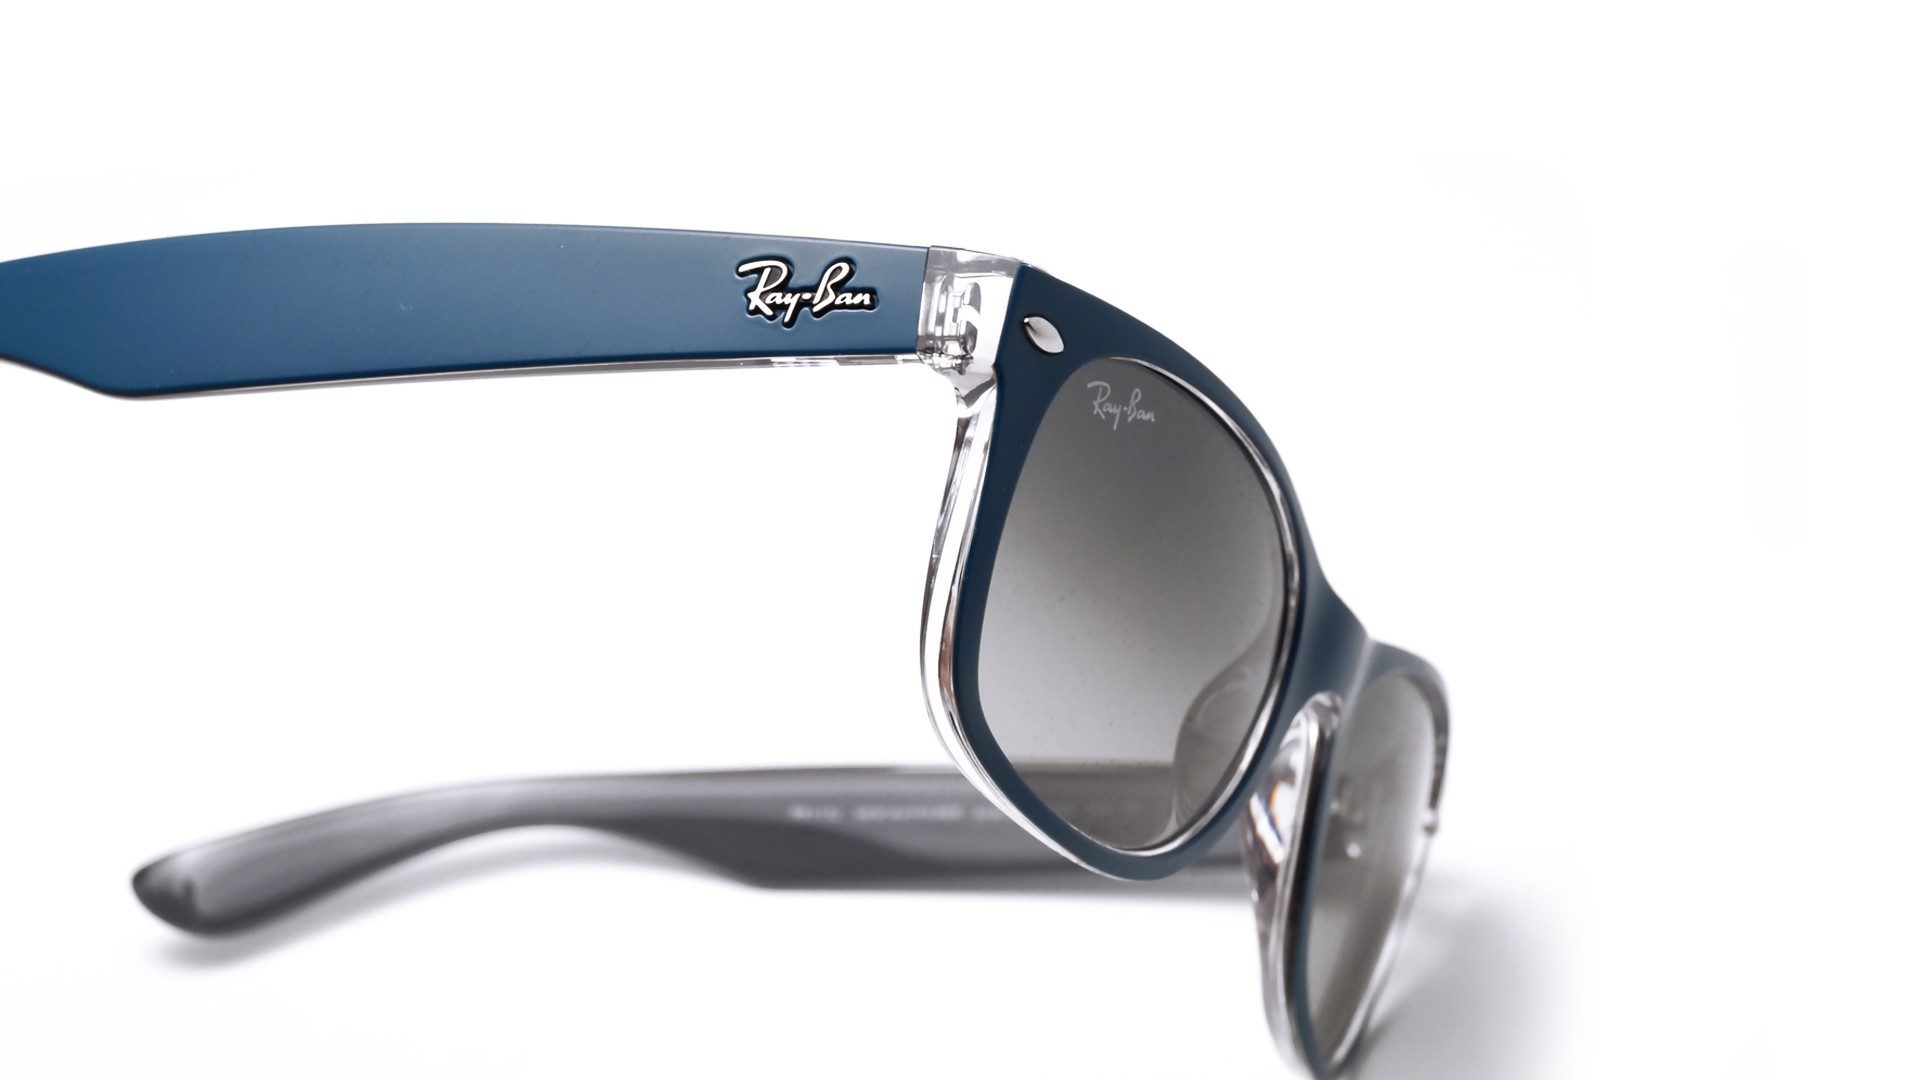 8a19cf68ecf Sunglasses Ray-Ban New Wayfarer Blue Matte RB2132 619171 55-18 Large  Gradient